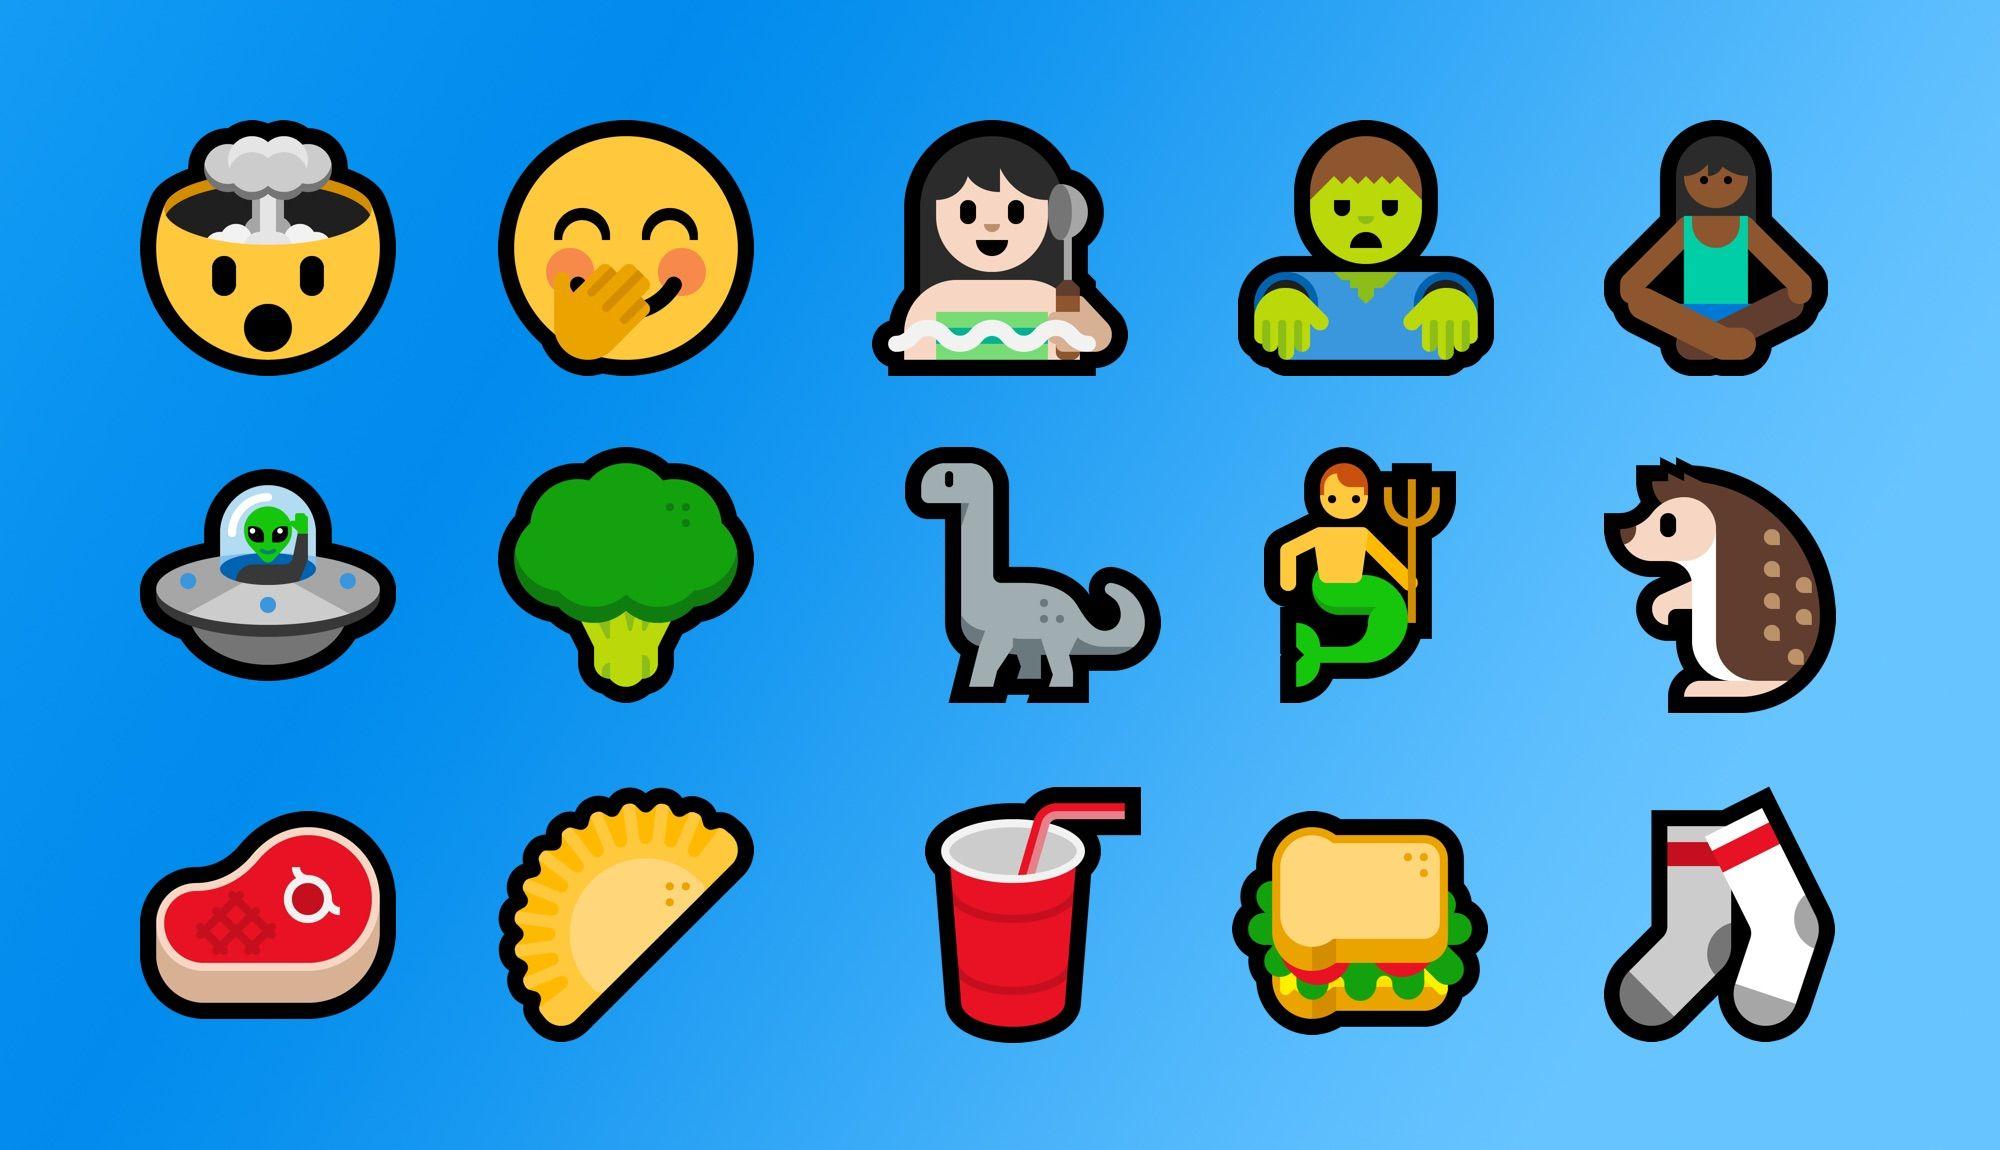 Windows 10 Fall Creators Update Emoji Changelog